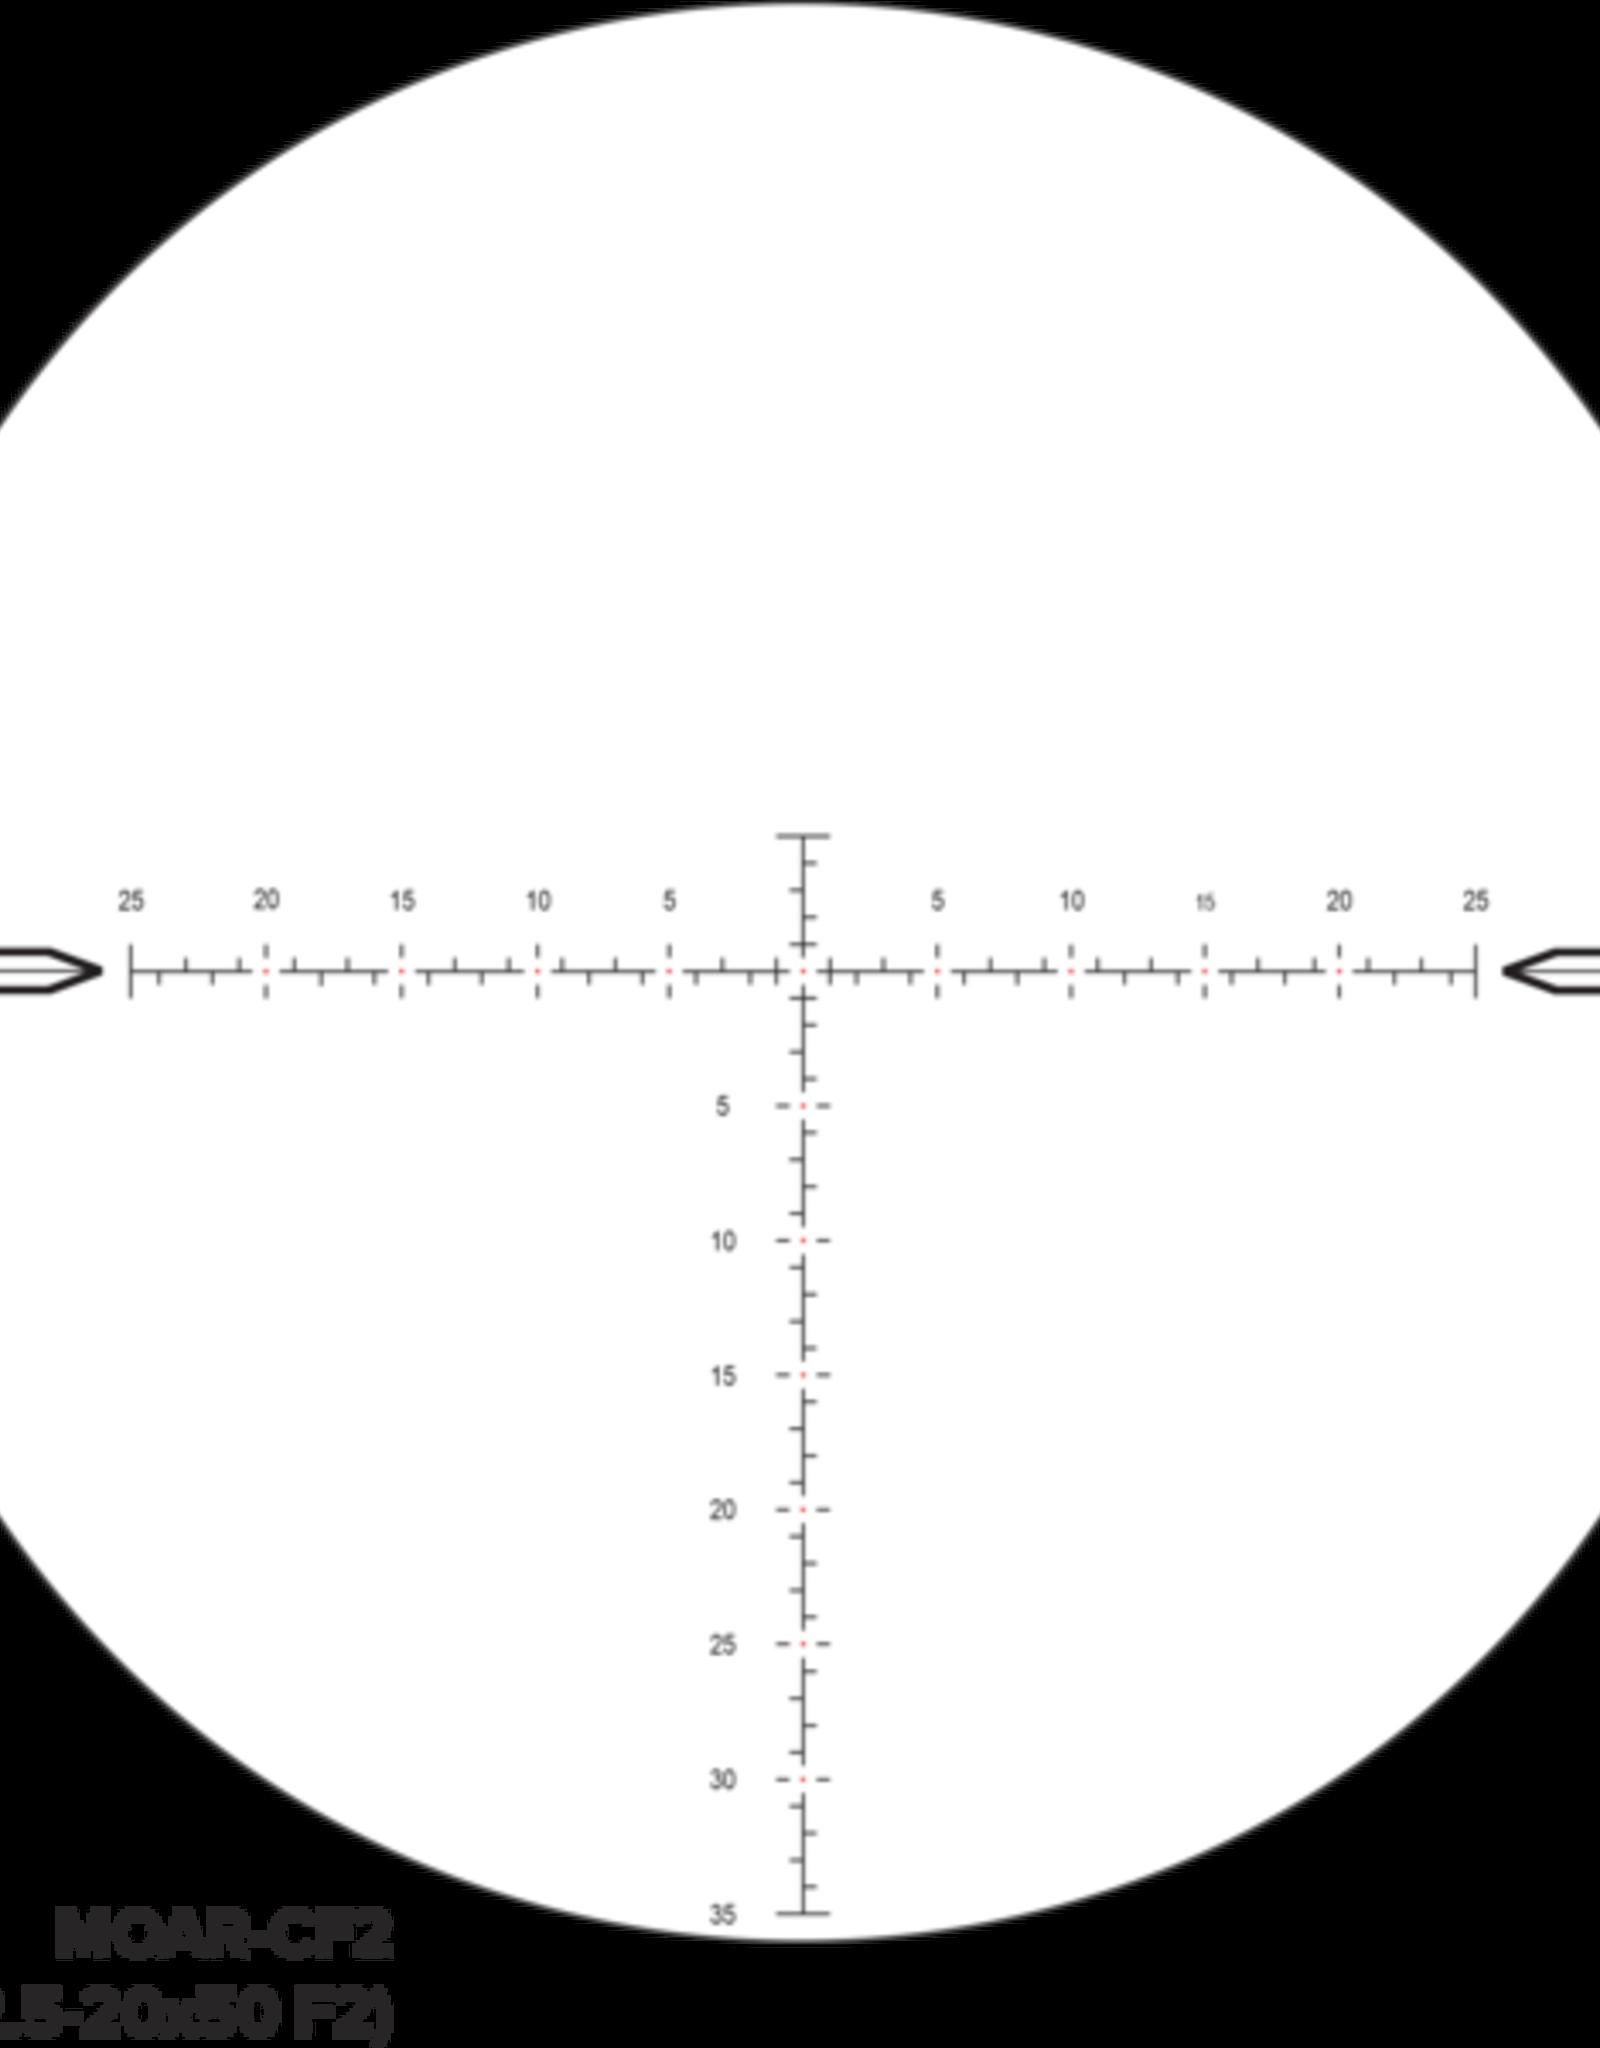 Nightforce NX8 2.5-20x50 Zstop MOAR CF2 reticle